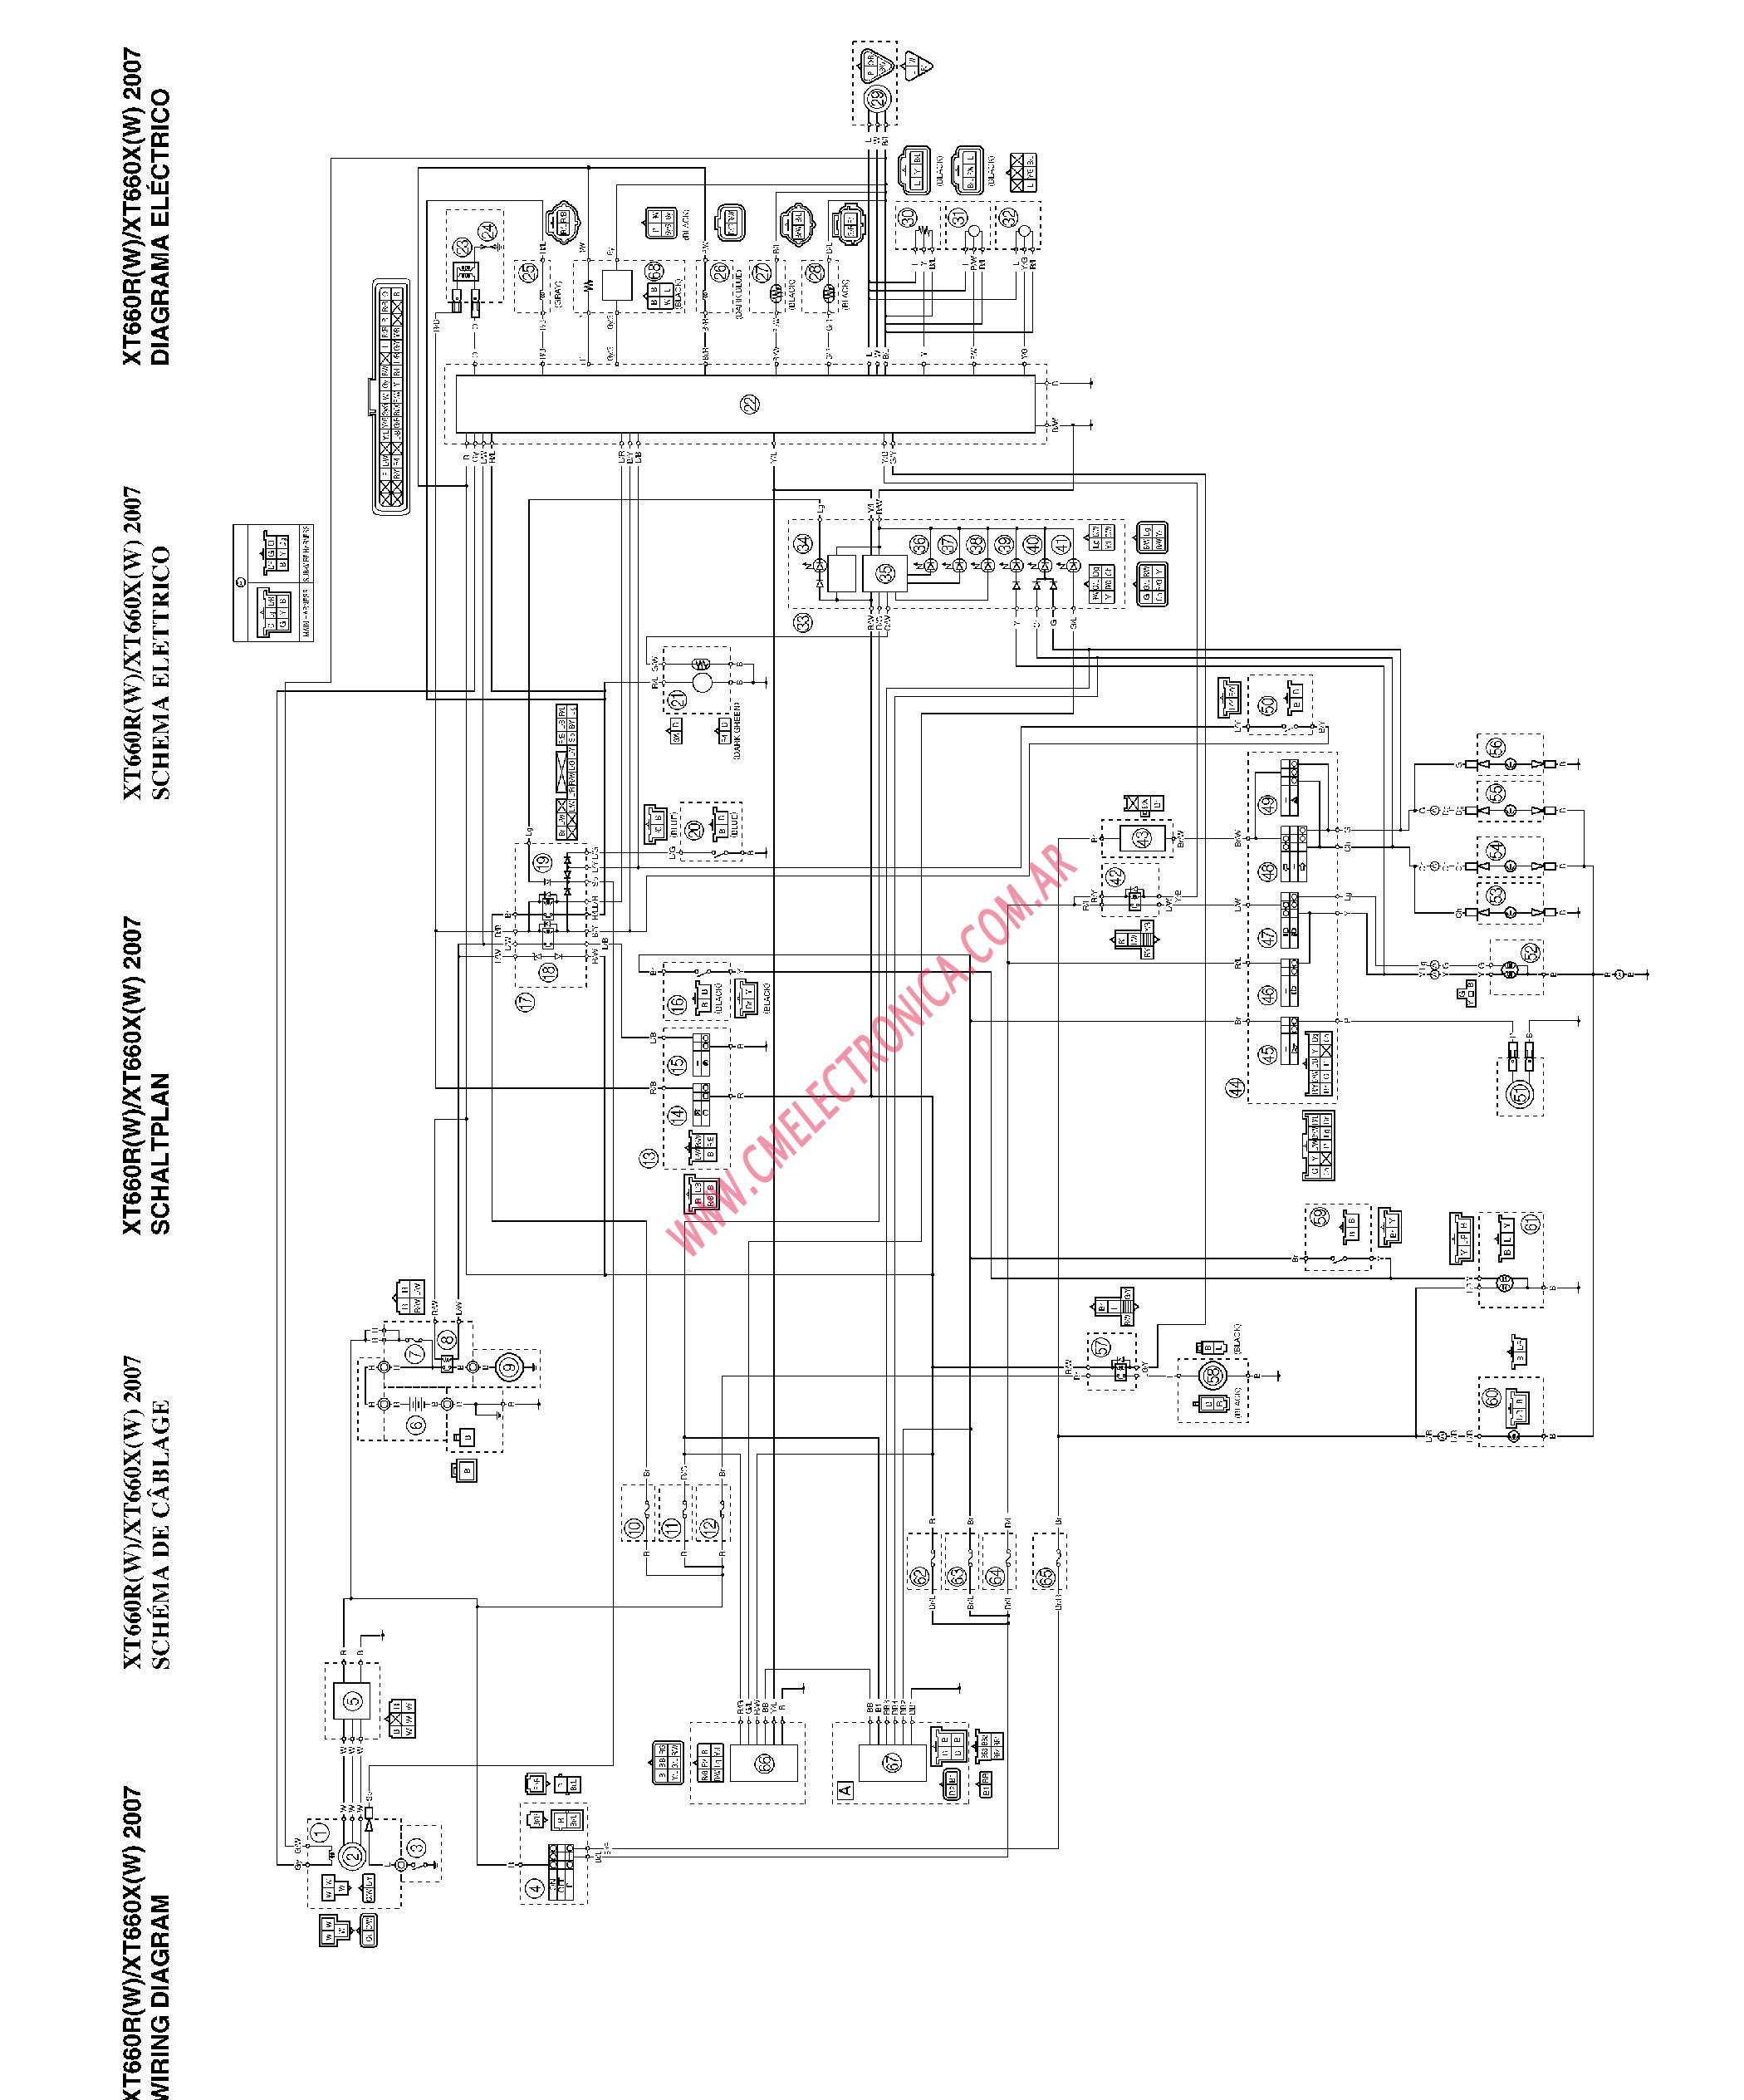 Großartig Ausweichen 318 Zündung Schaltplan 1988 Ideen - Elektrische ...